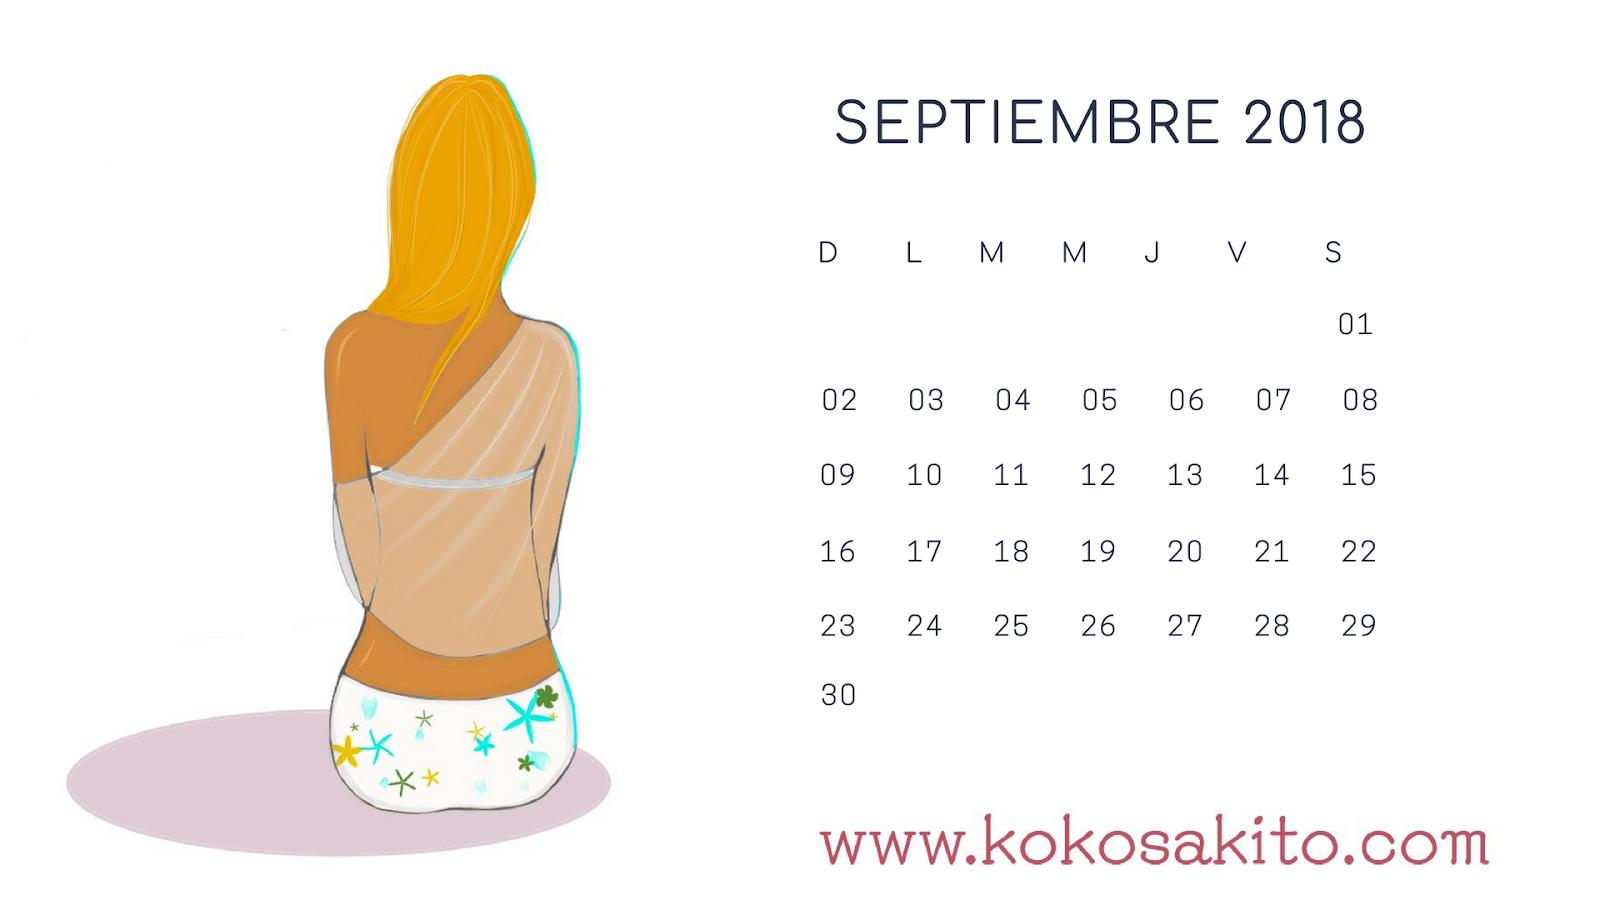 Calendario Dibujo Septiembre.Koko Sakito Dibujos Historietas Carteles Libretas